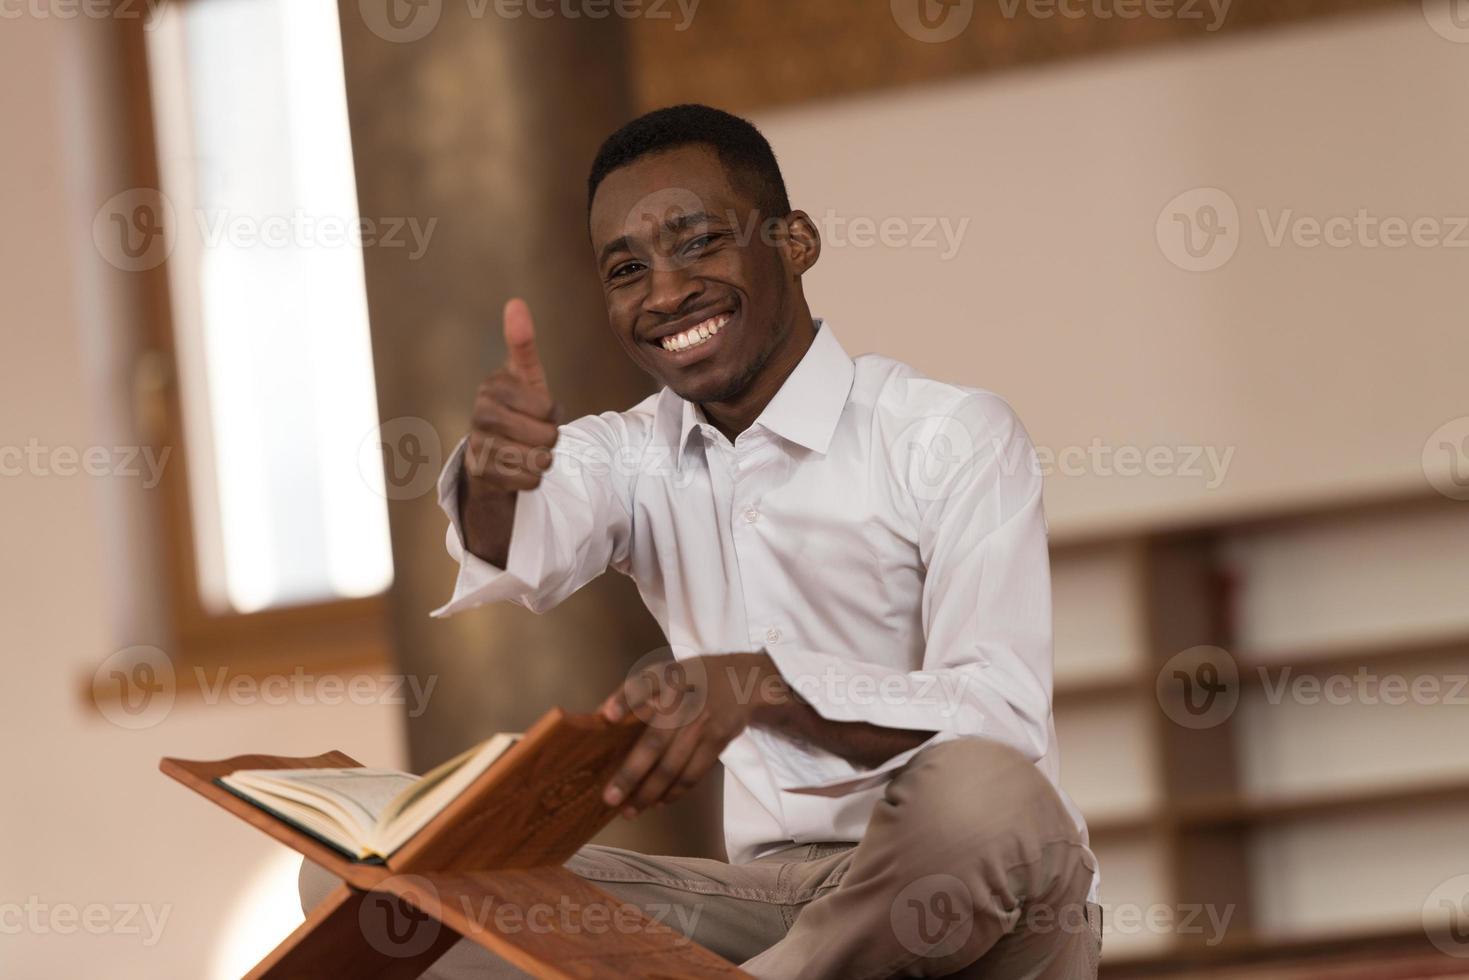 zwarte Afrikaanse moslim man duimen opdagen foto